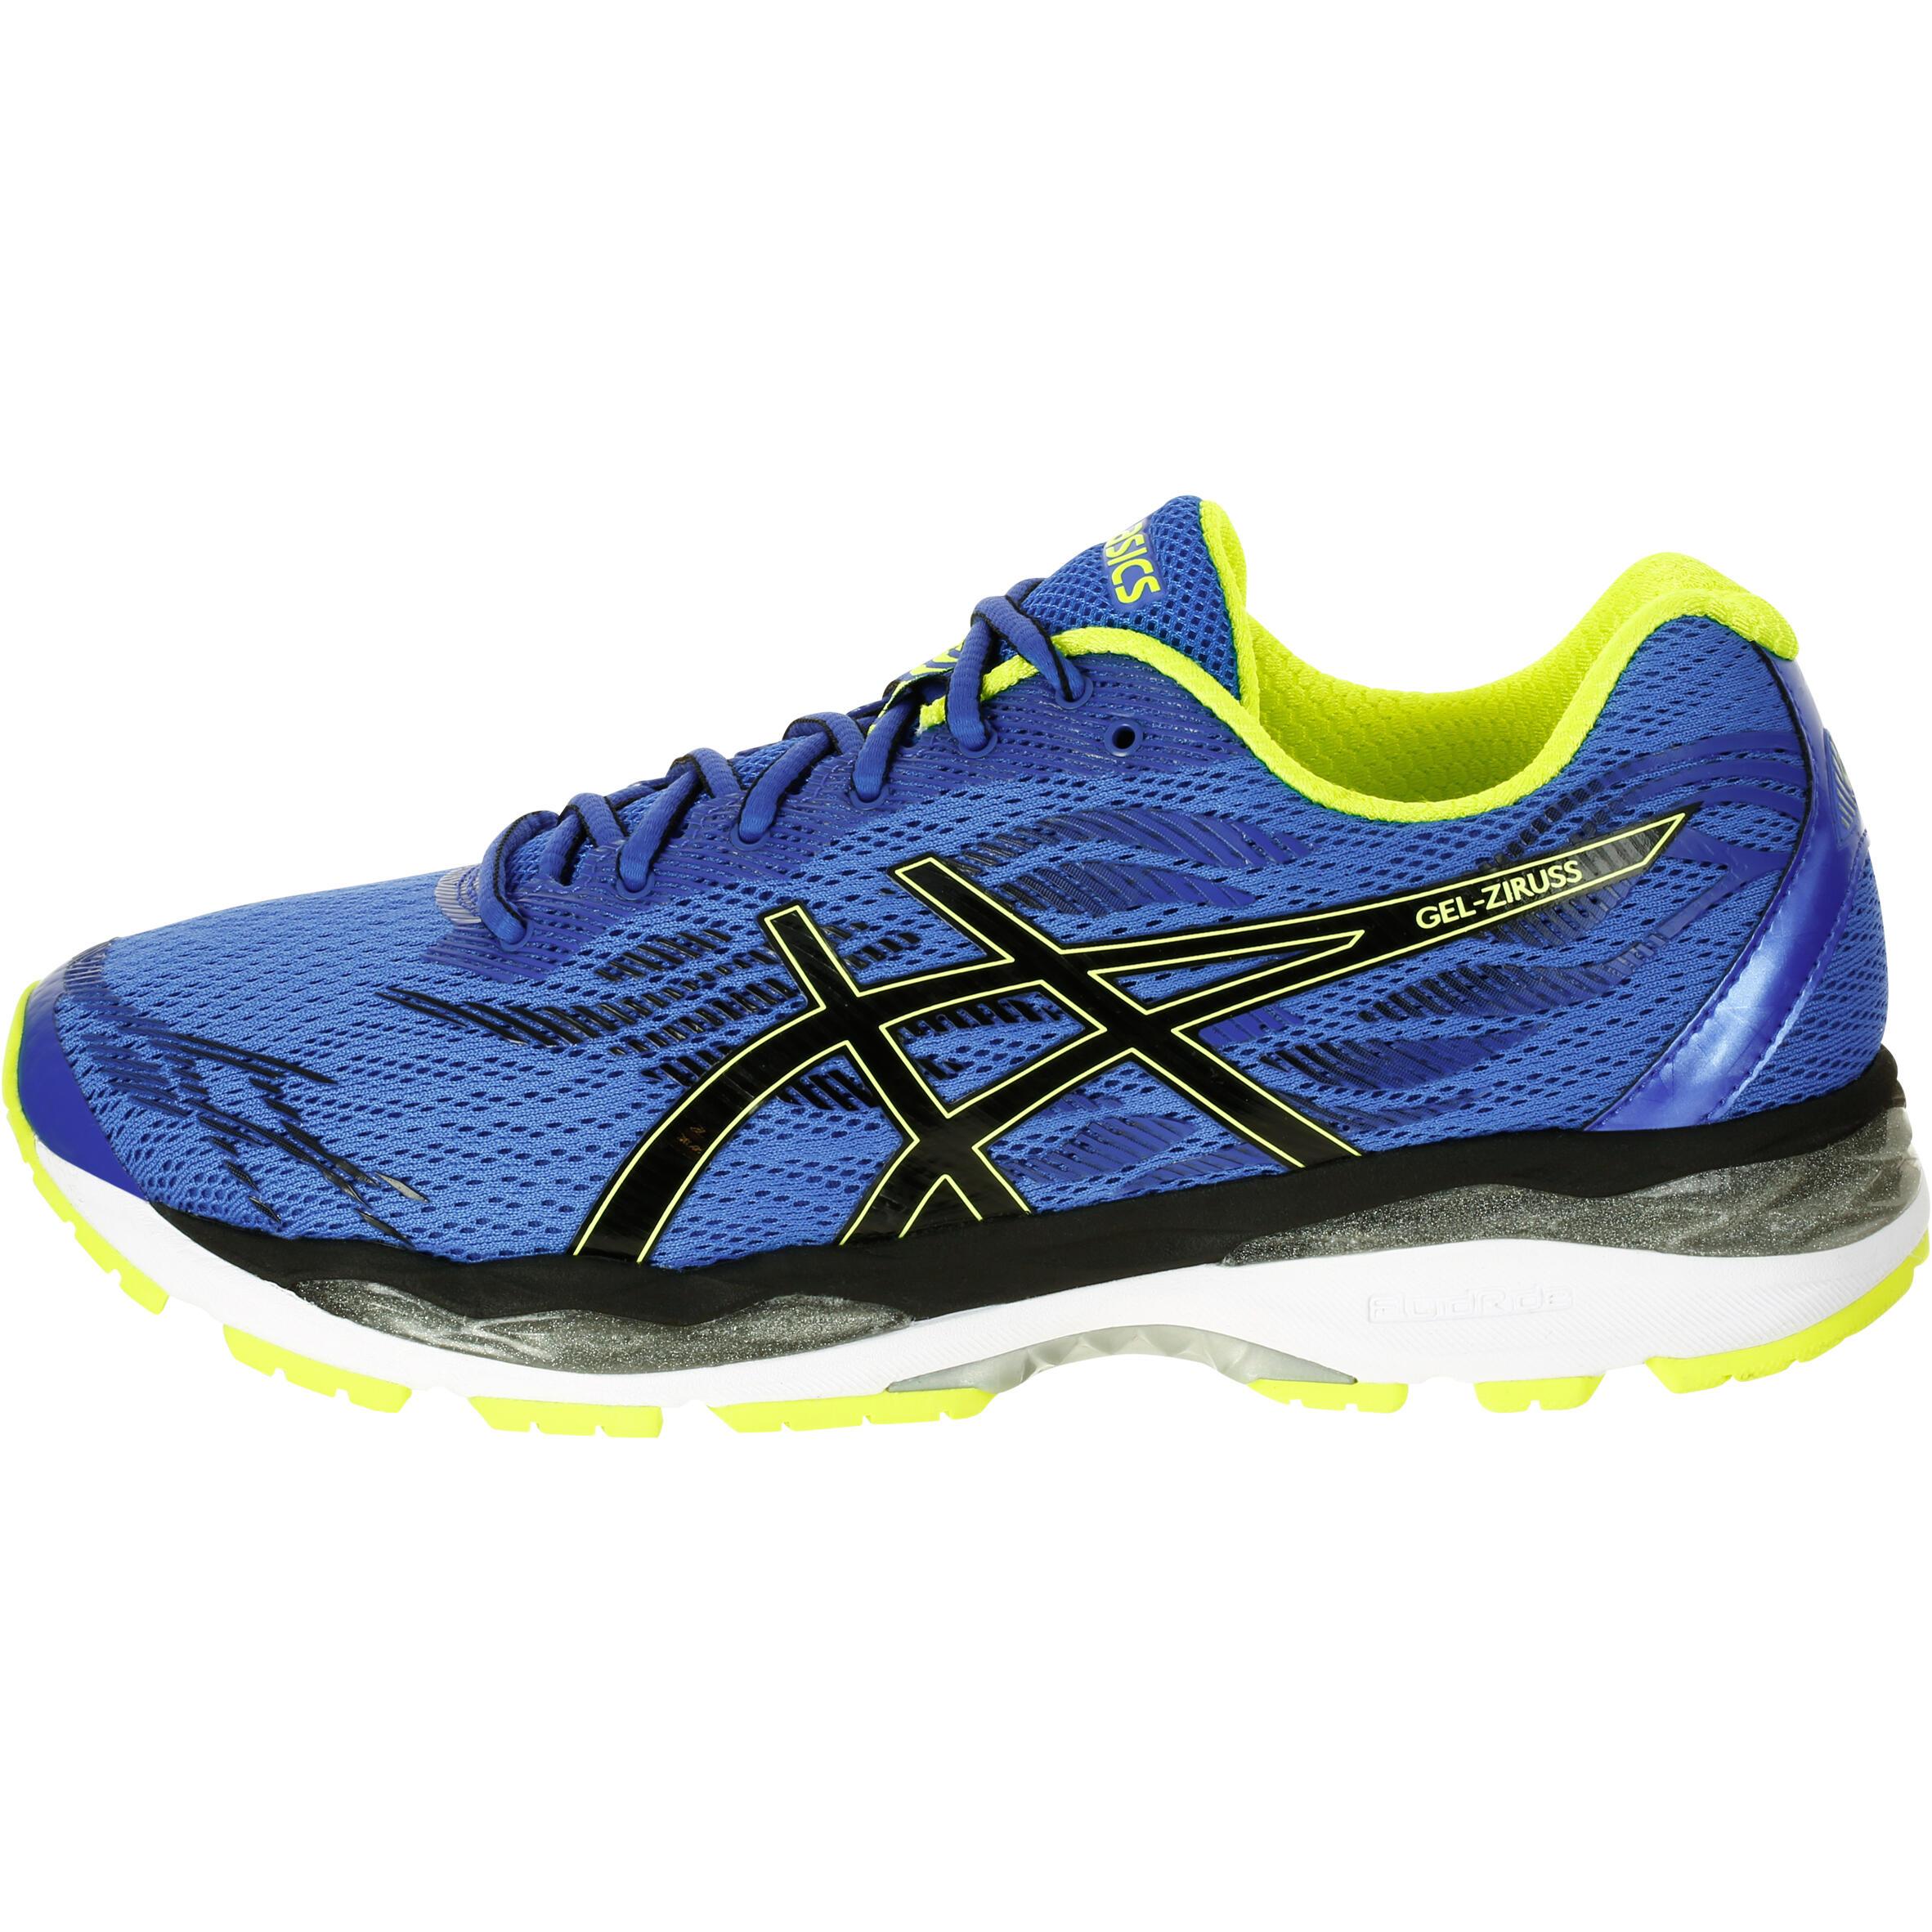 website for discount limited guantity classic fit Chaussures Ziruss Gel Decathlon Asics Homme Jaune Bleu ...